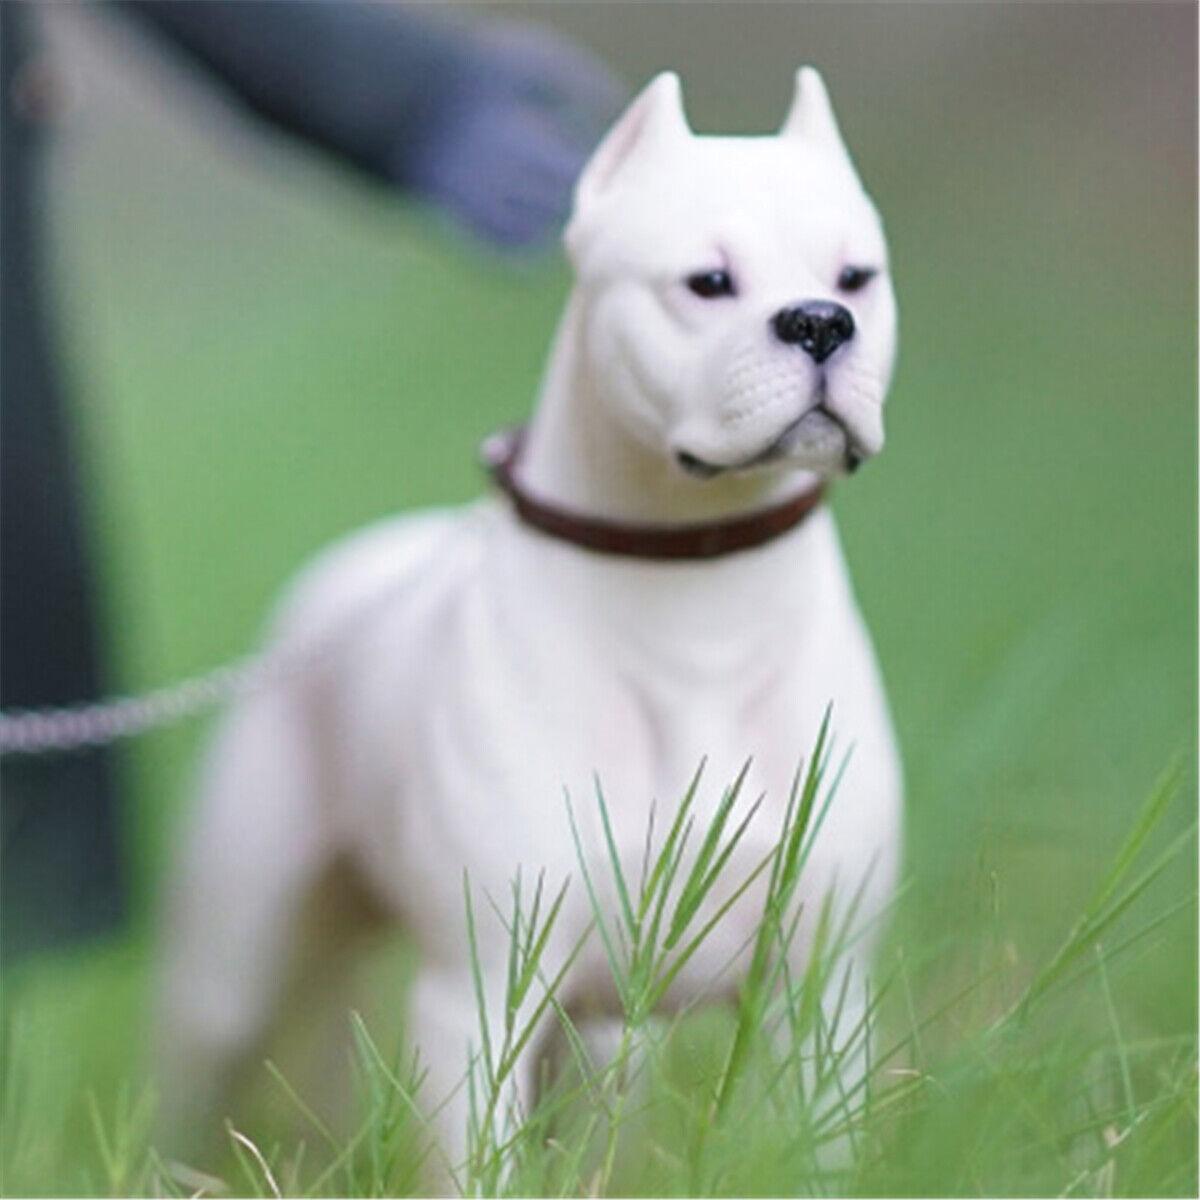 M7 1 6 Dogo silverinos Statue Dog Pet Figure Animal Model Decoration Toy Gift